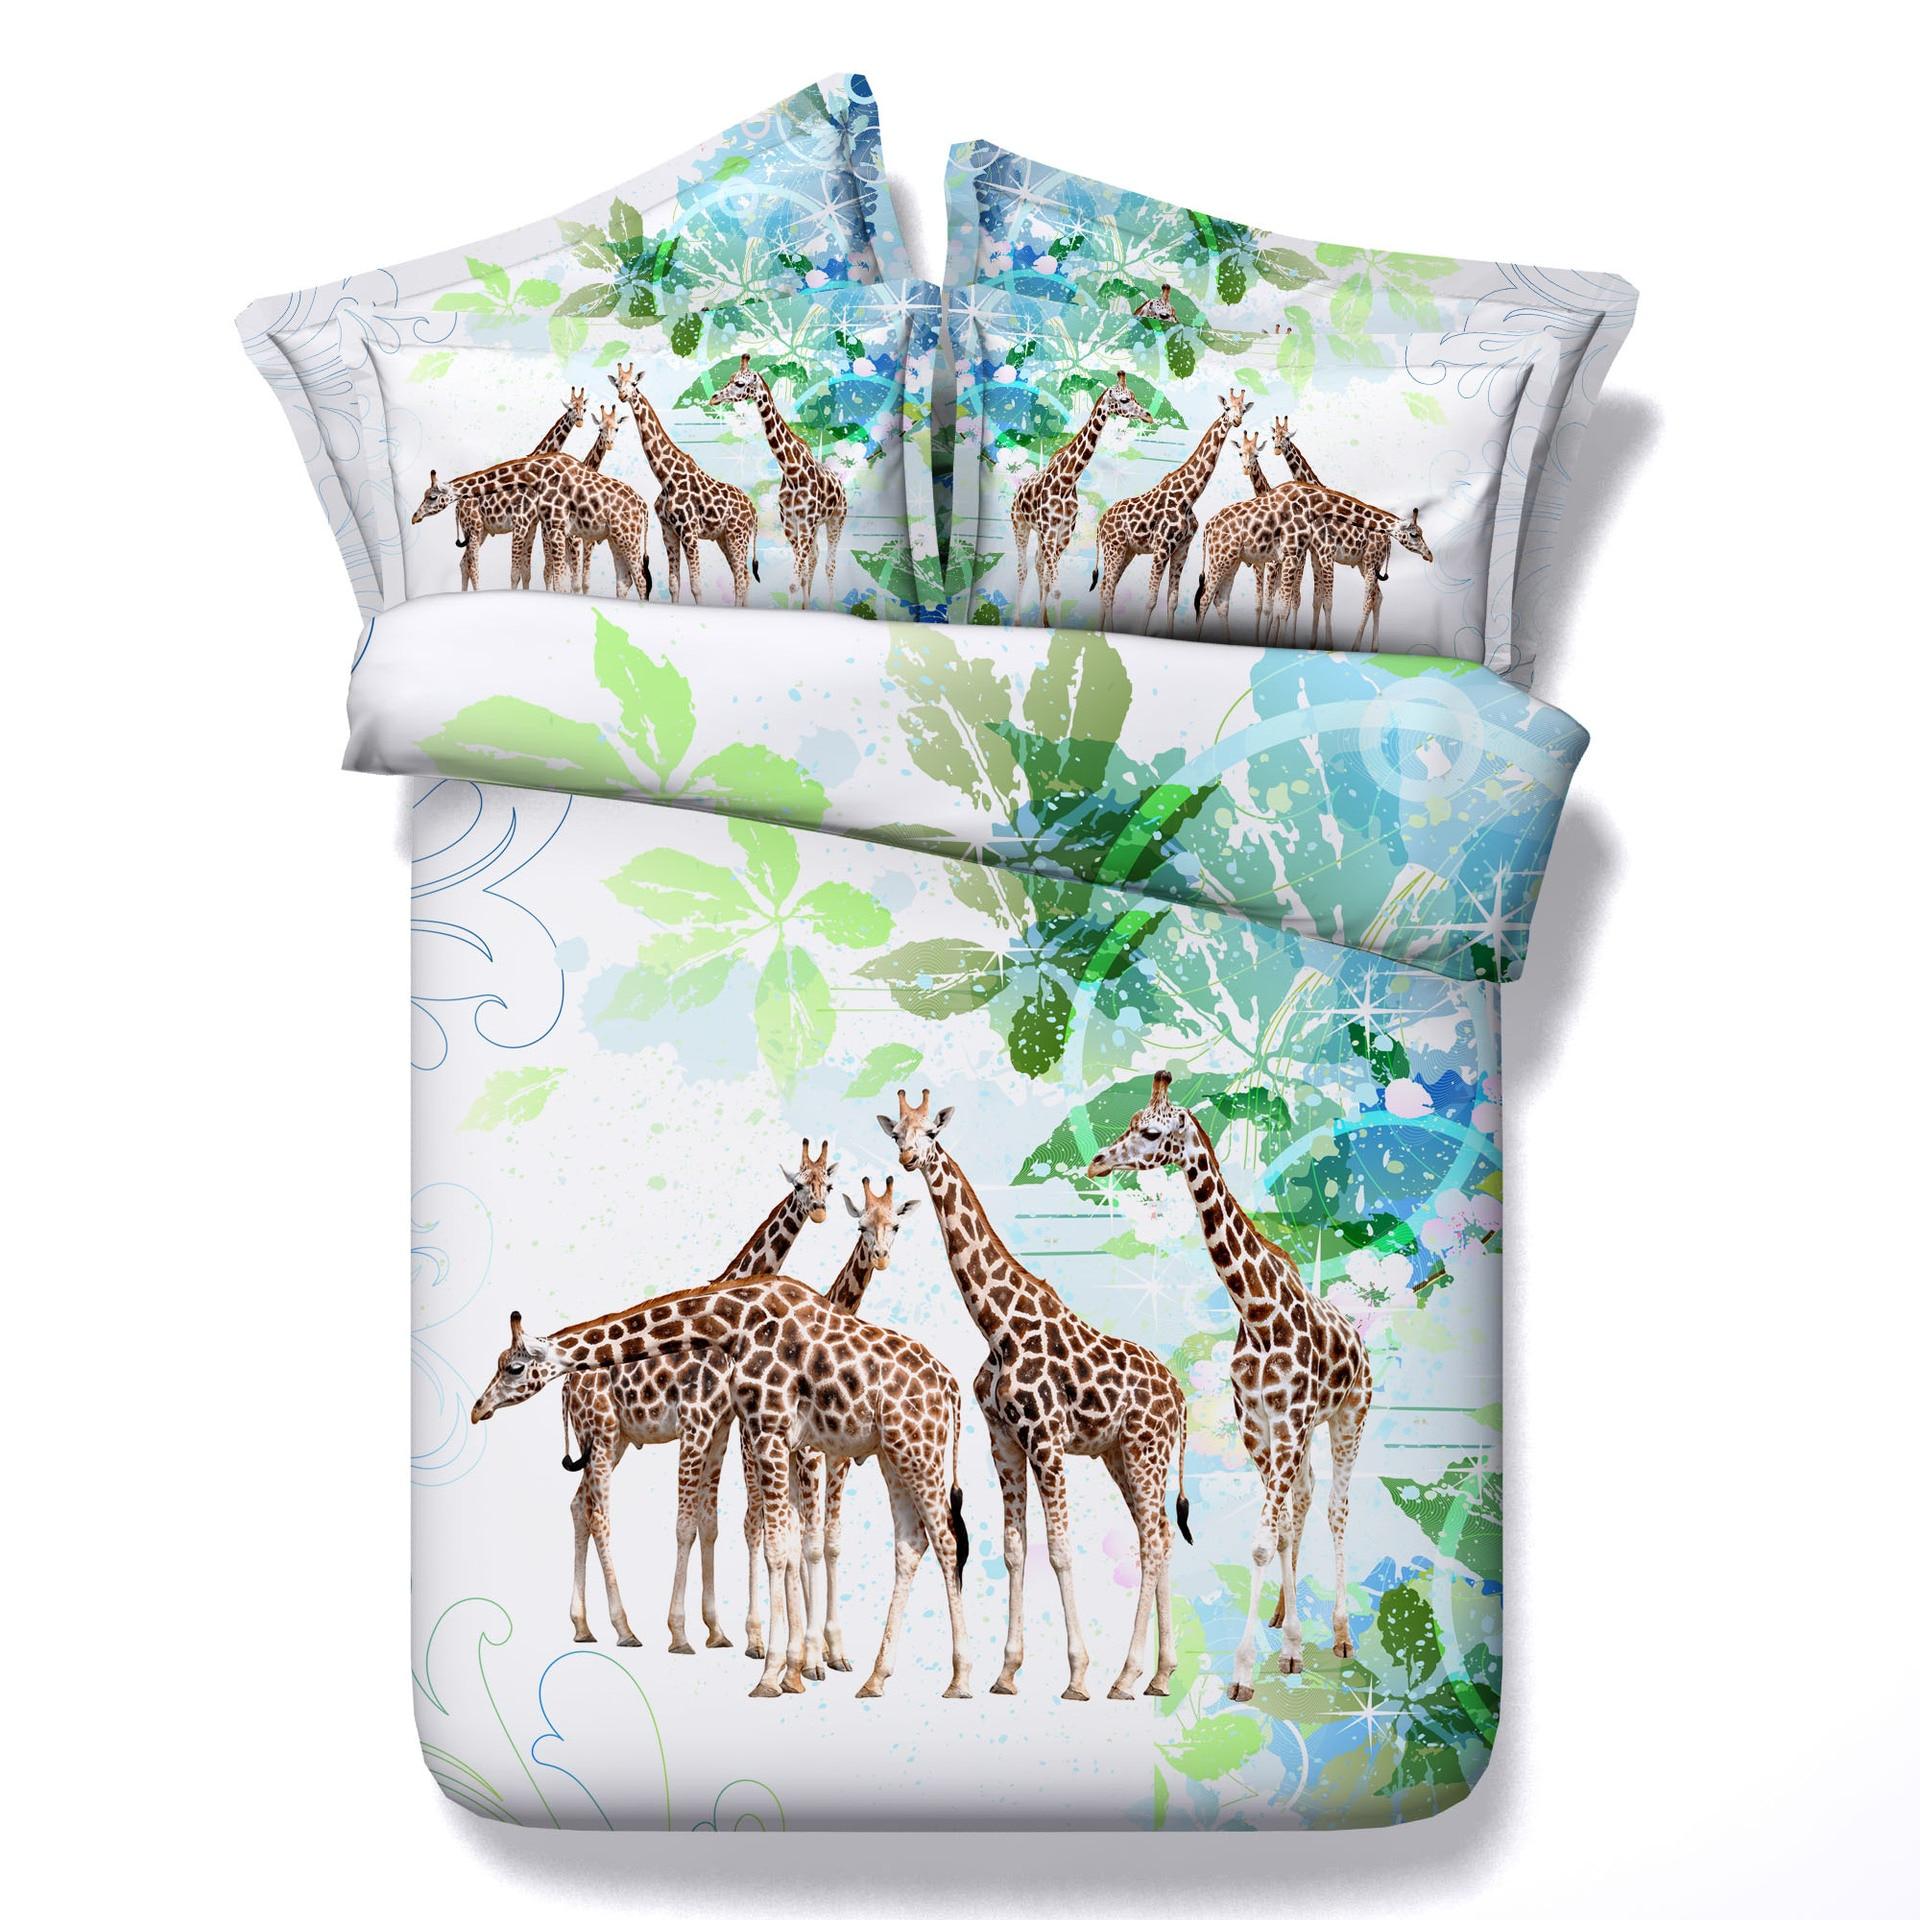 Power Source New Home Textile 3d Giraffe Zoo Animal Kids Bedding Sets Bedlinen Duvet Cover Pillowcase Bedlinen Set For Chilren Boy Adult Set Providing Amenities For The People; Making Life Easier For The Population